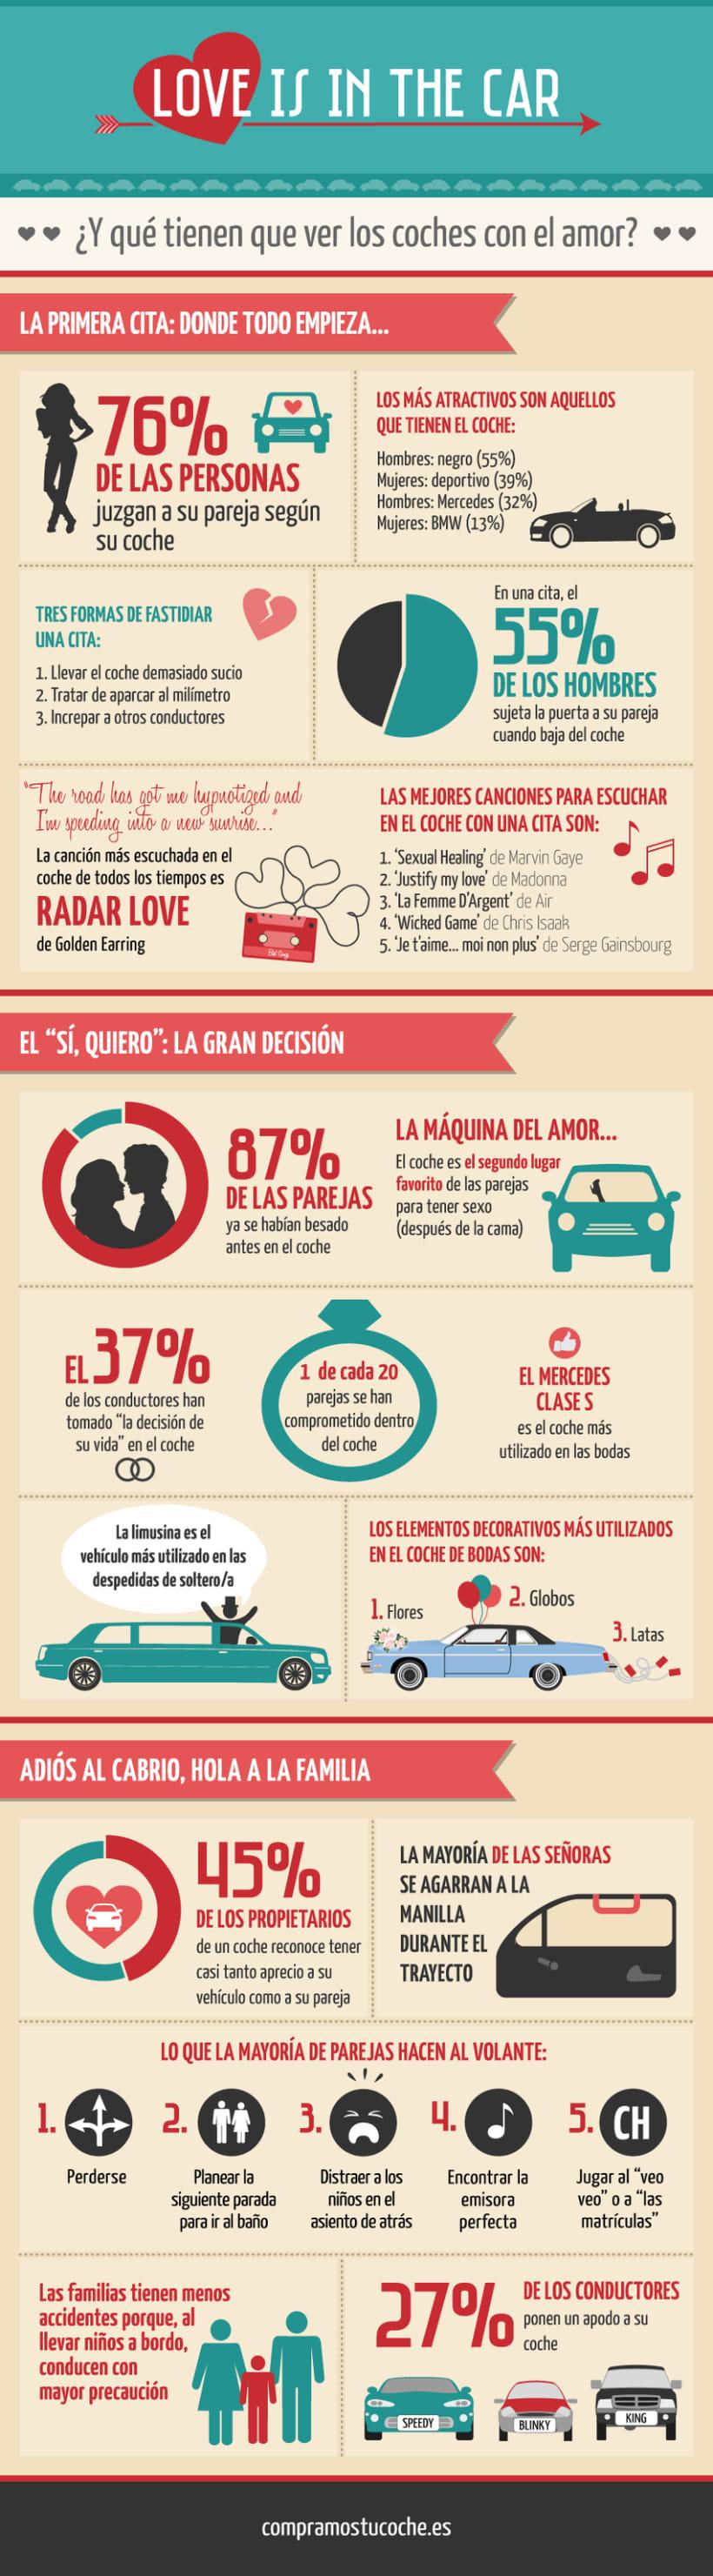 "Infografía ""Love is in the car""  2"